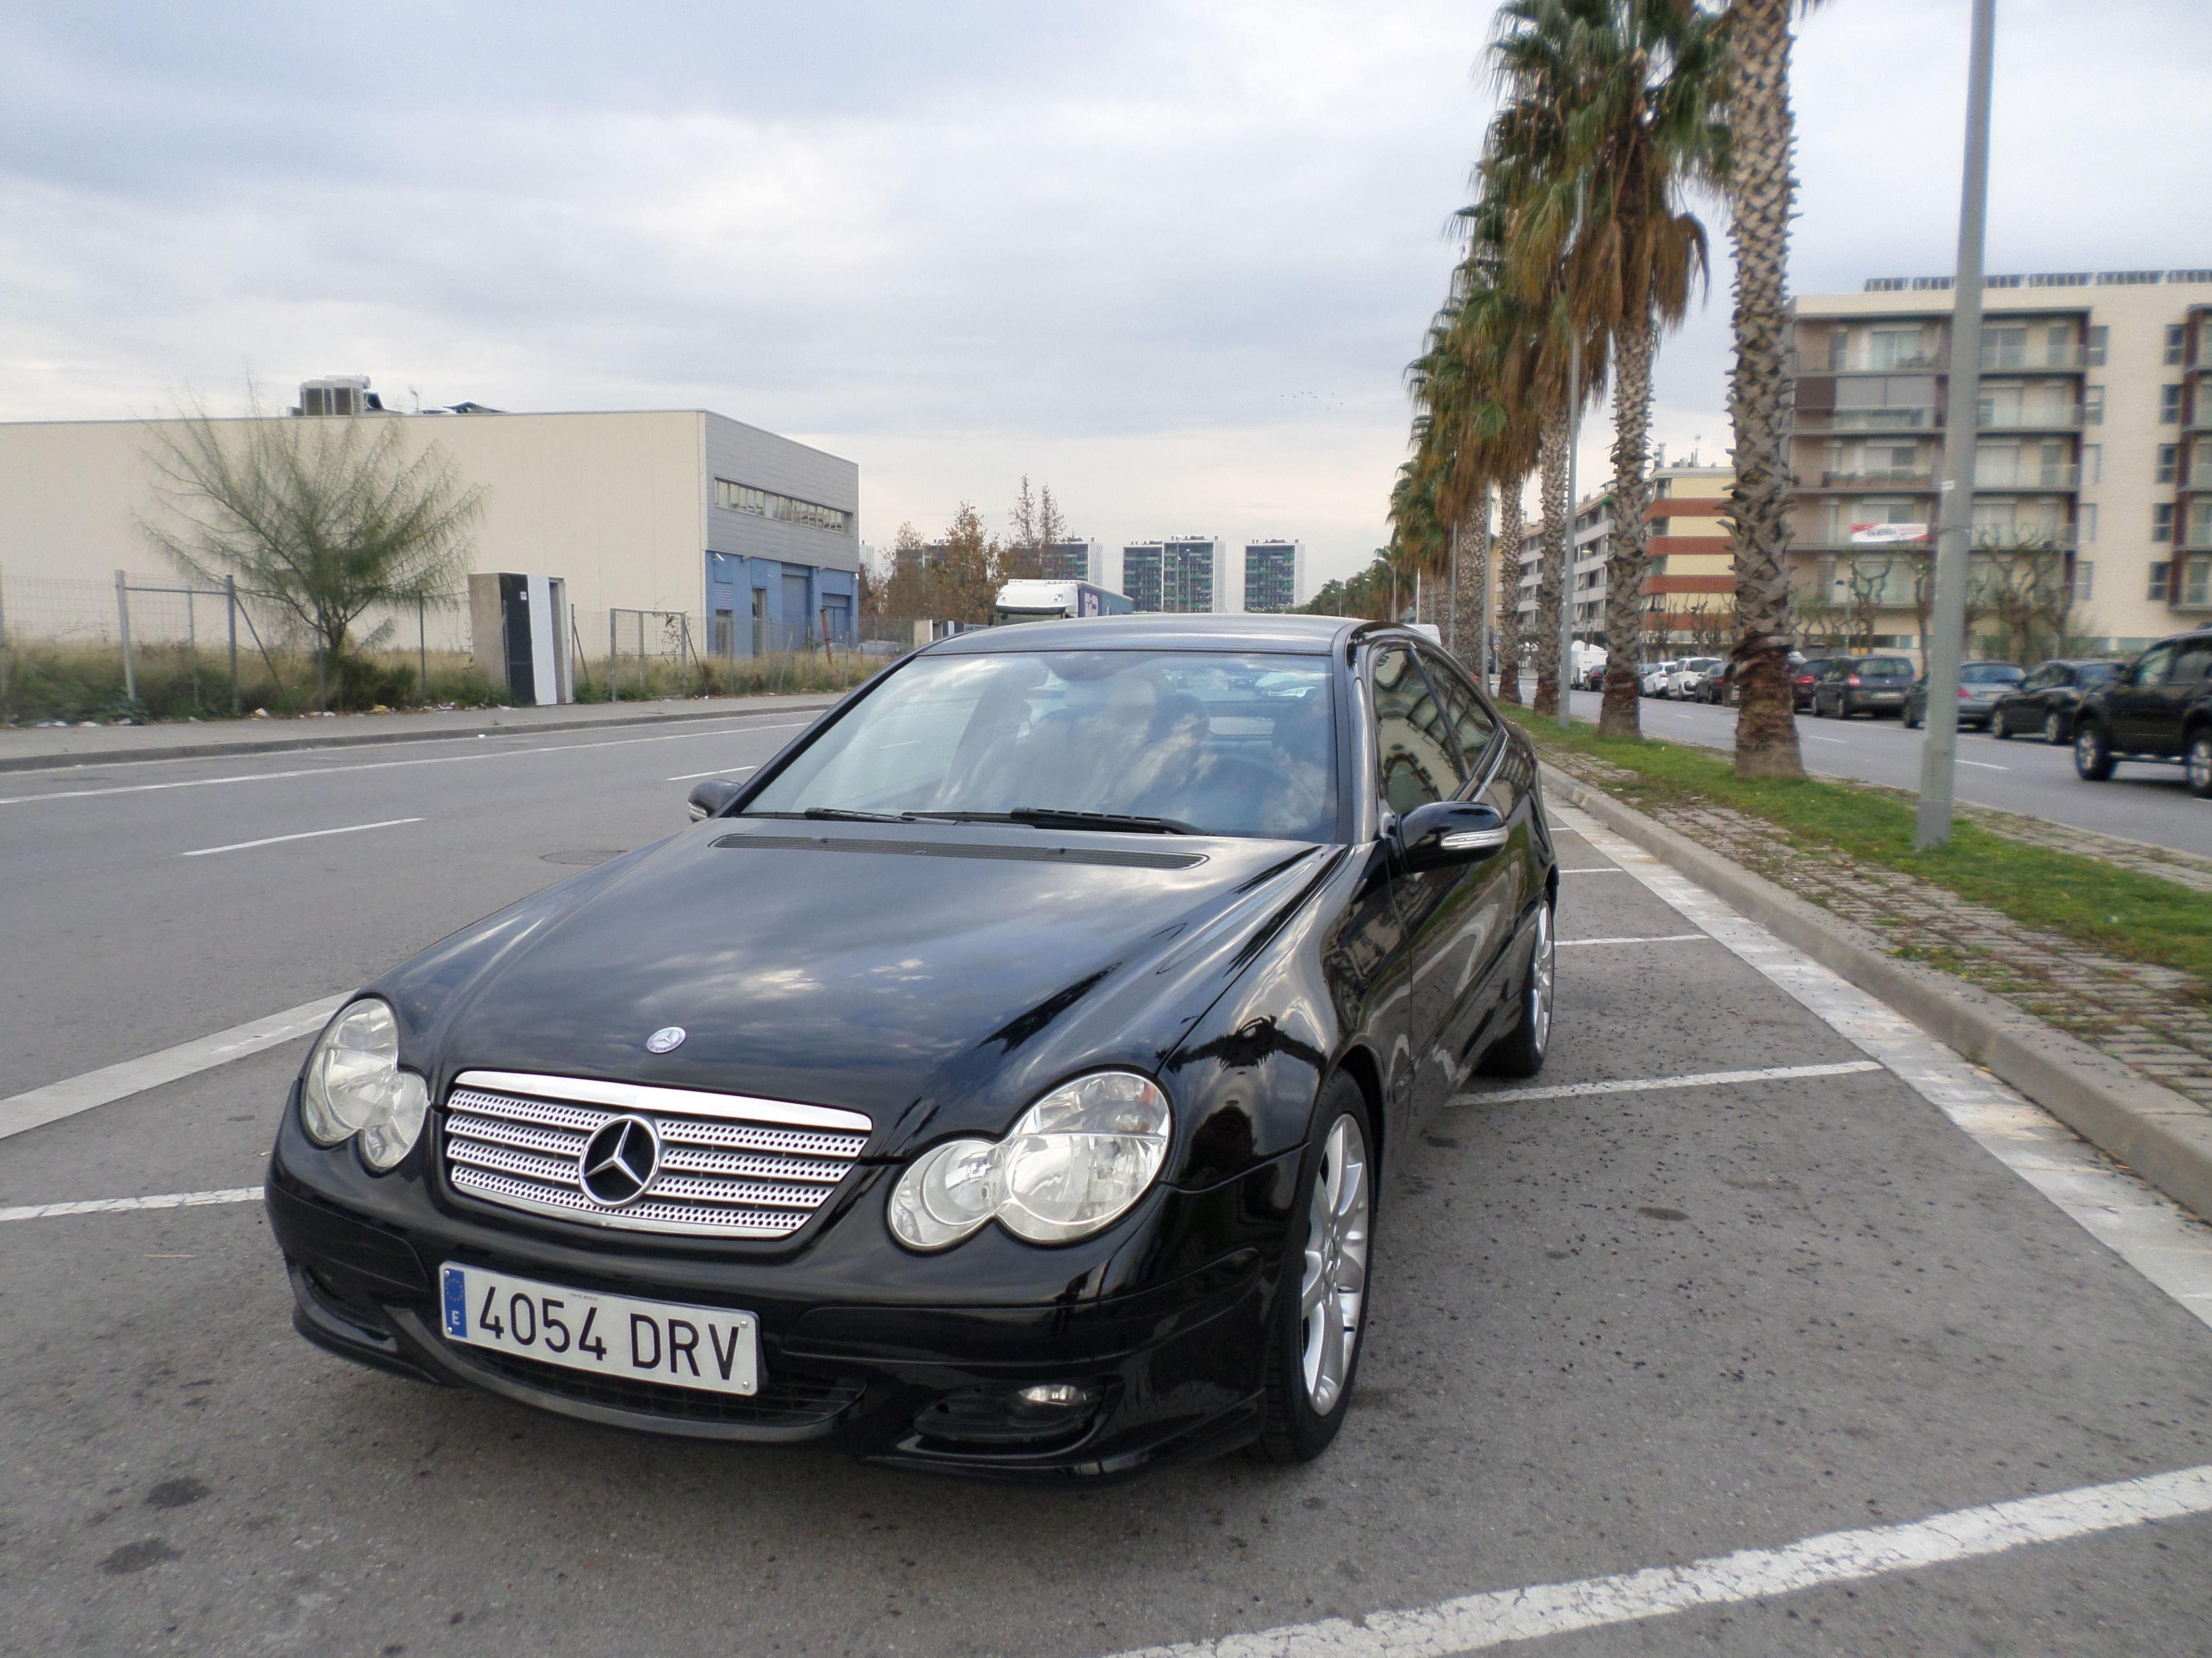 Mercedes-Benz Clase CC 160 K Sport Coupe 3p pvp5900 €uros: Servicios de reparación  de Automóviles y Talleres Dorado